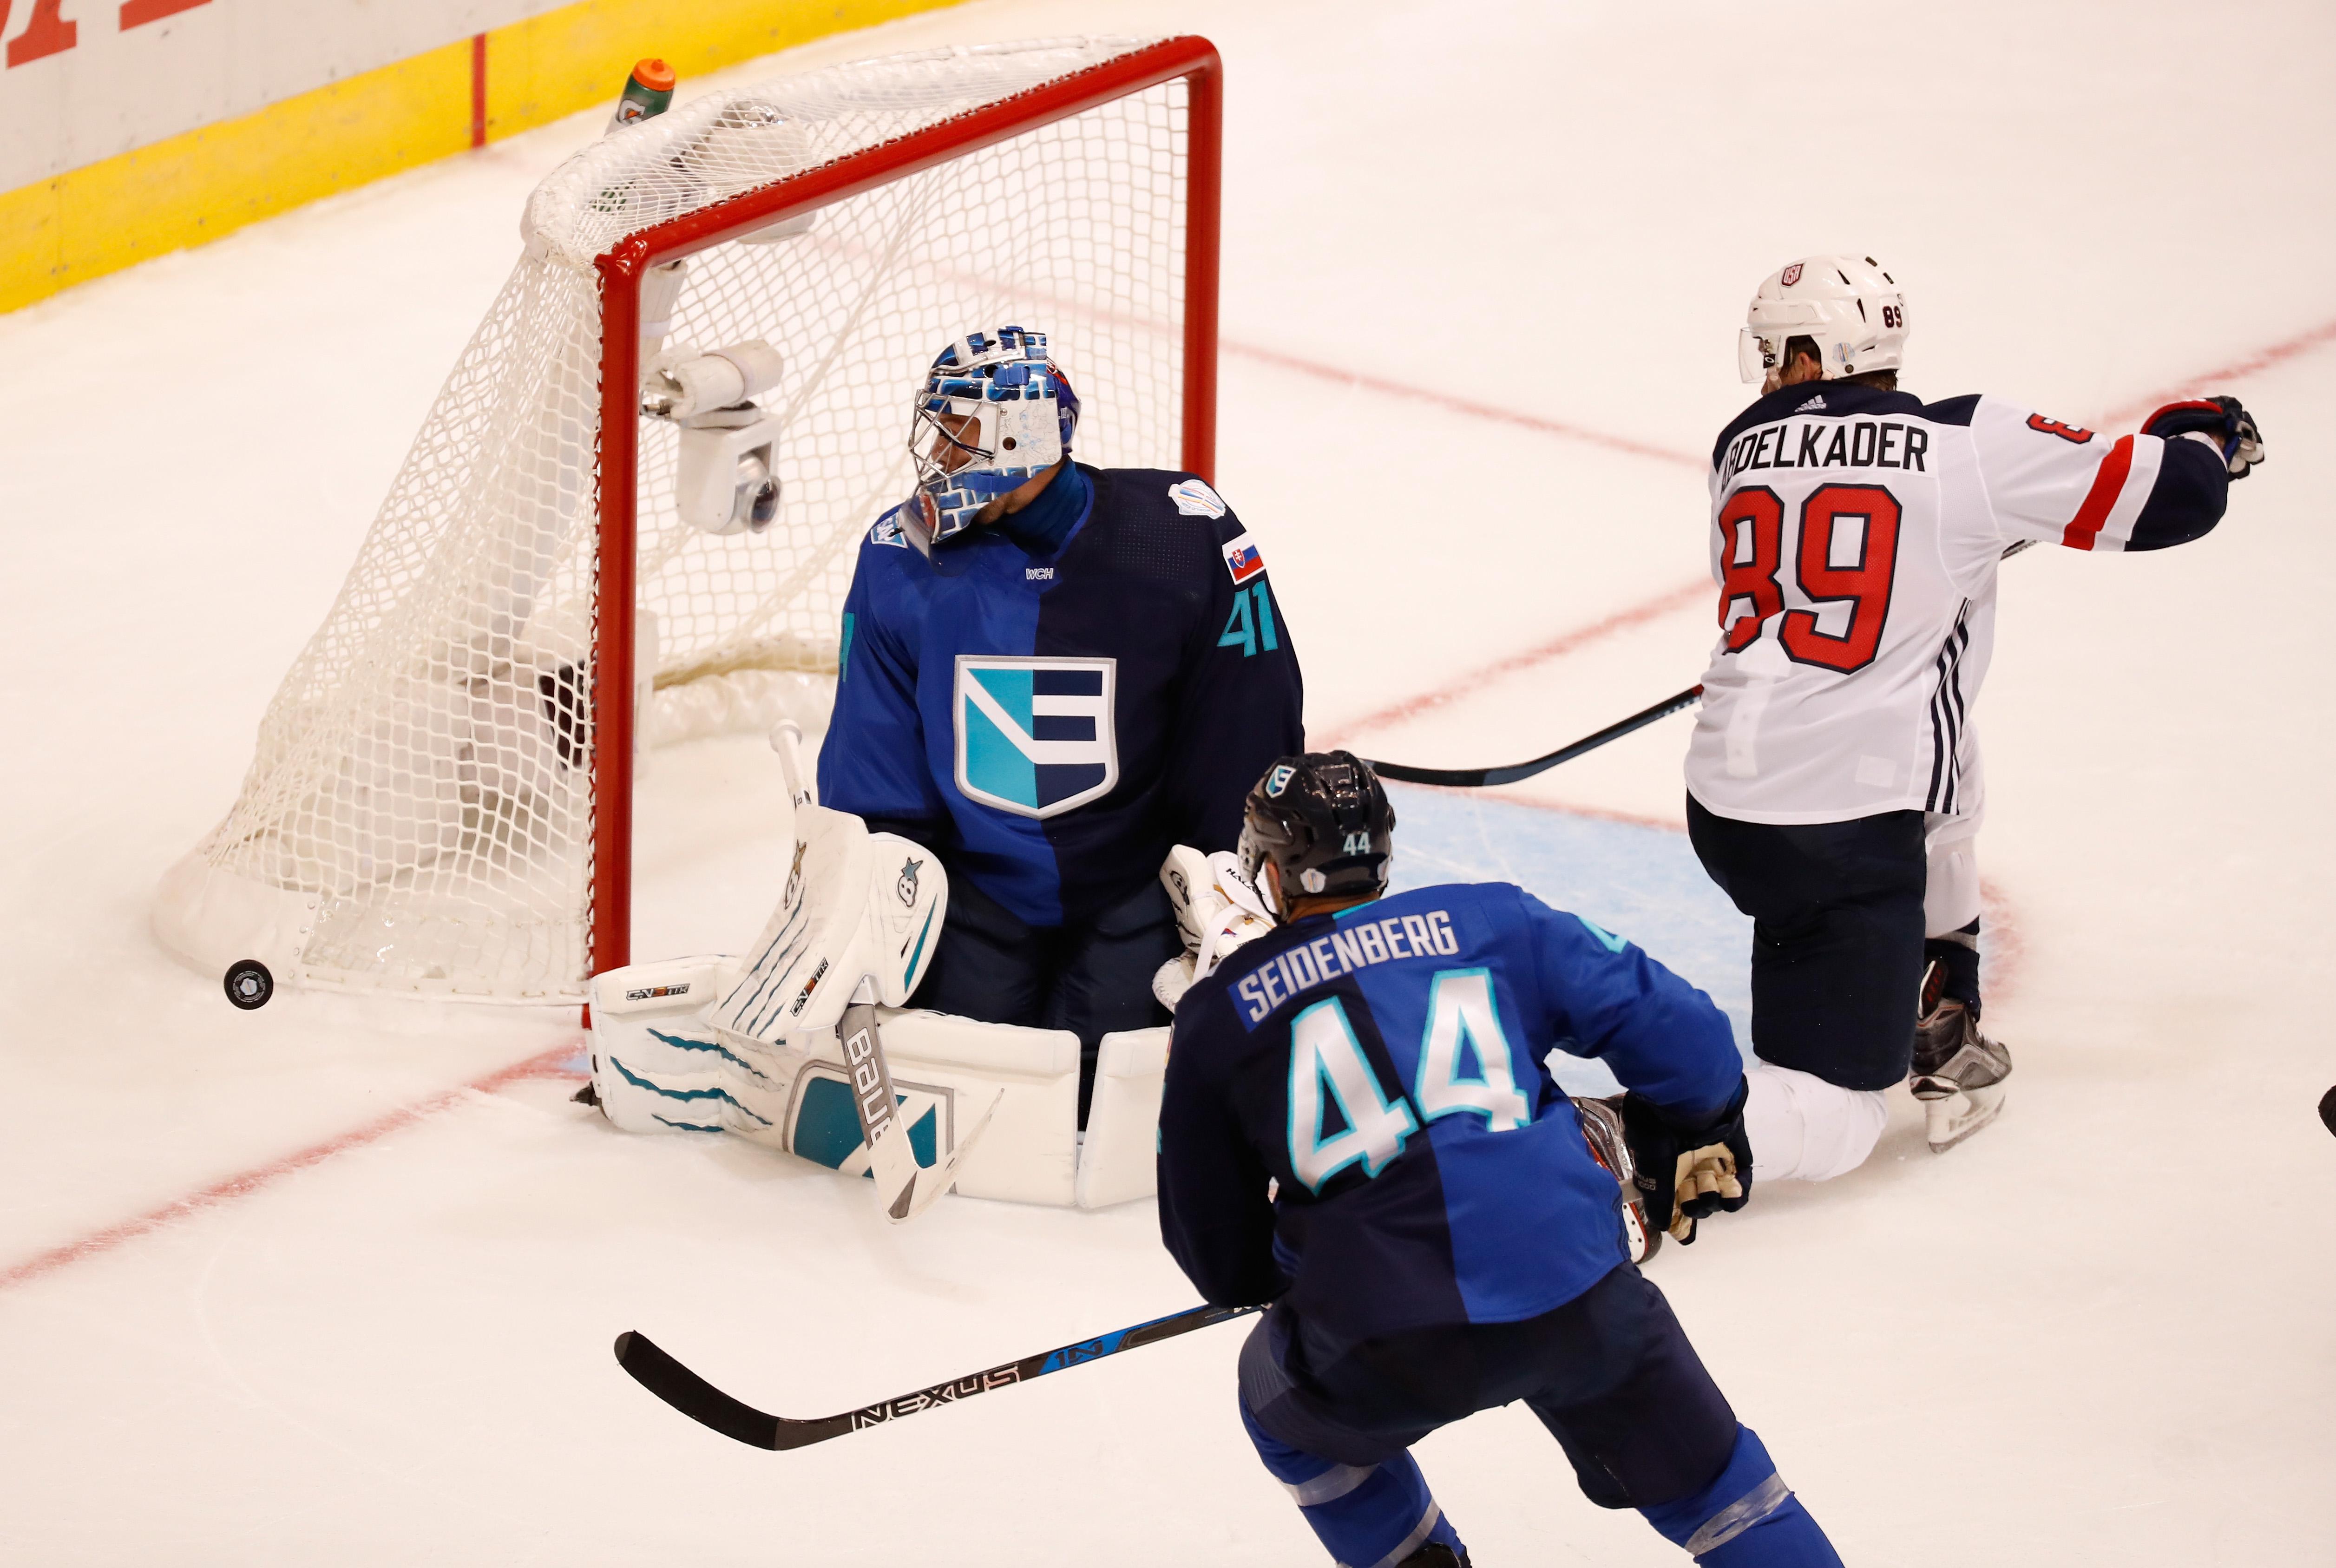 World Cup Of Hockey 2016 - United States v Team Europe